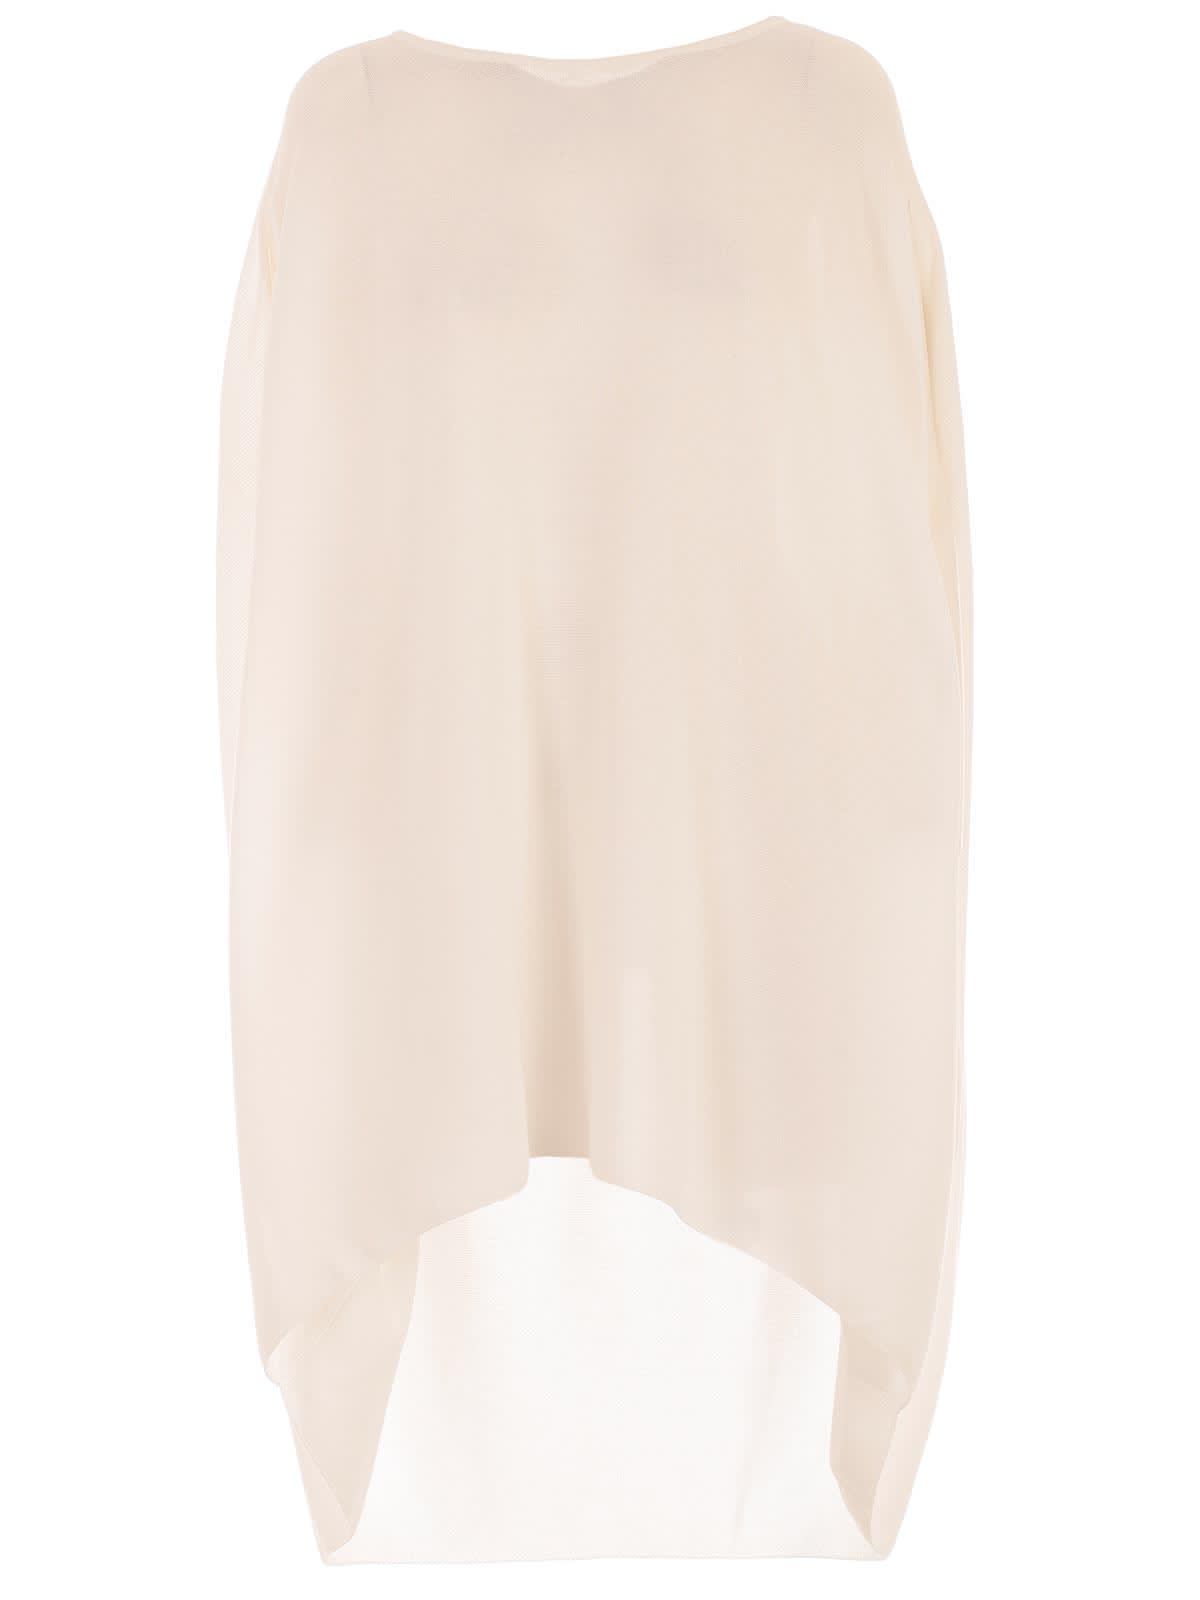 Buy Issey Miyake Dress W/s Tunic Crew Neck Fantasy online, shop Issey Miyake with free shipping